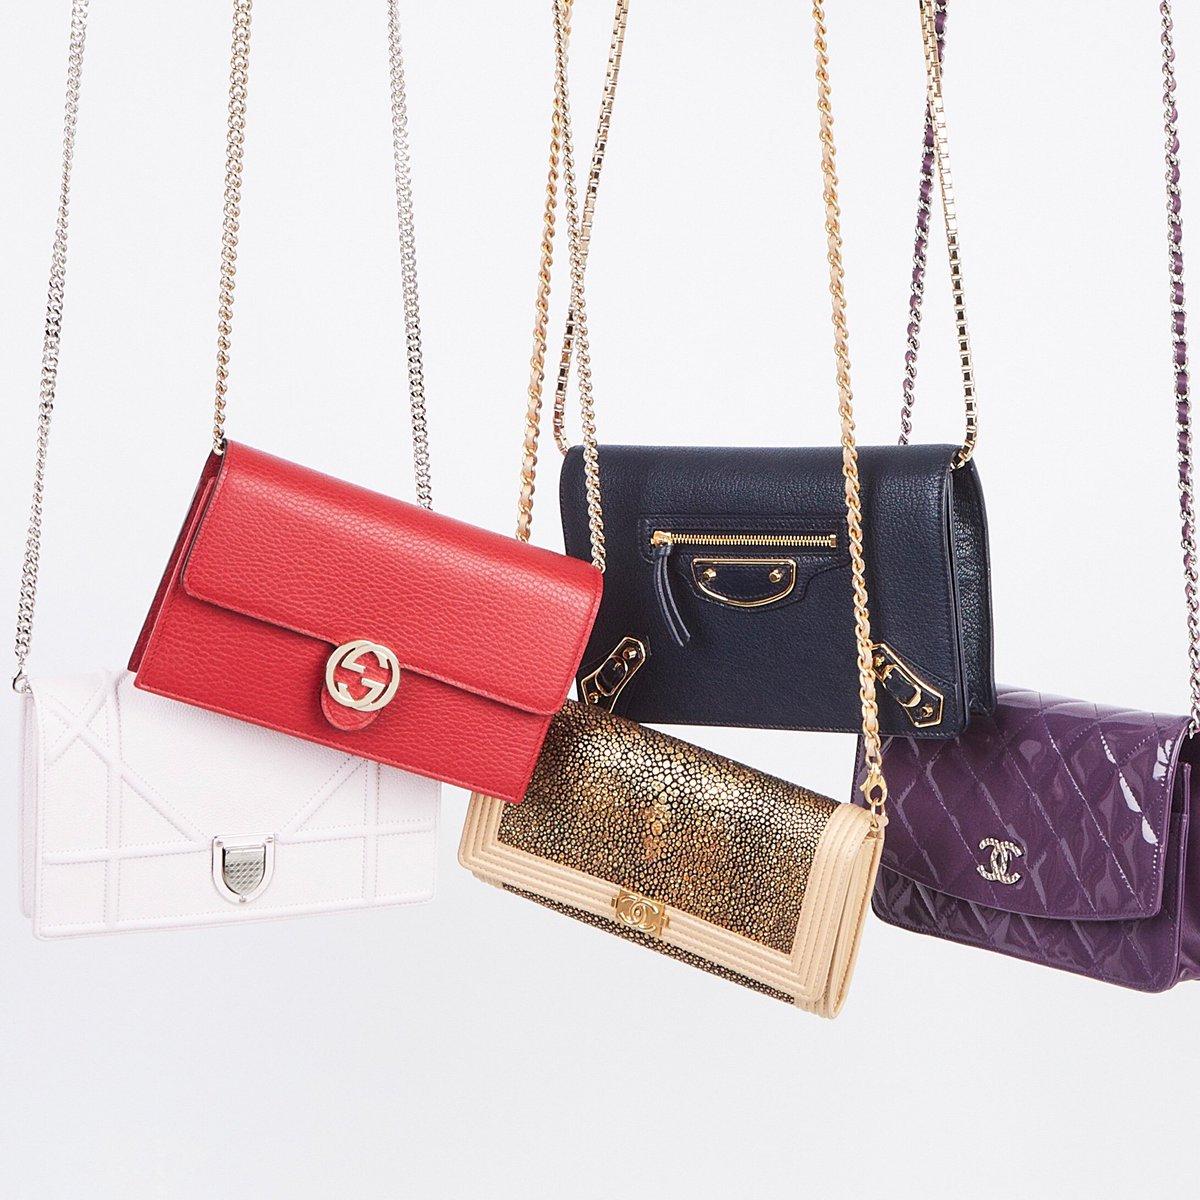 Are Louis Vuitton Bags Made In Usa Yoogis Closet Blog >> Yoogi S Closet Yoogiscloset Twitter